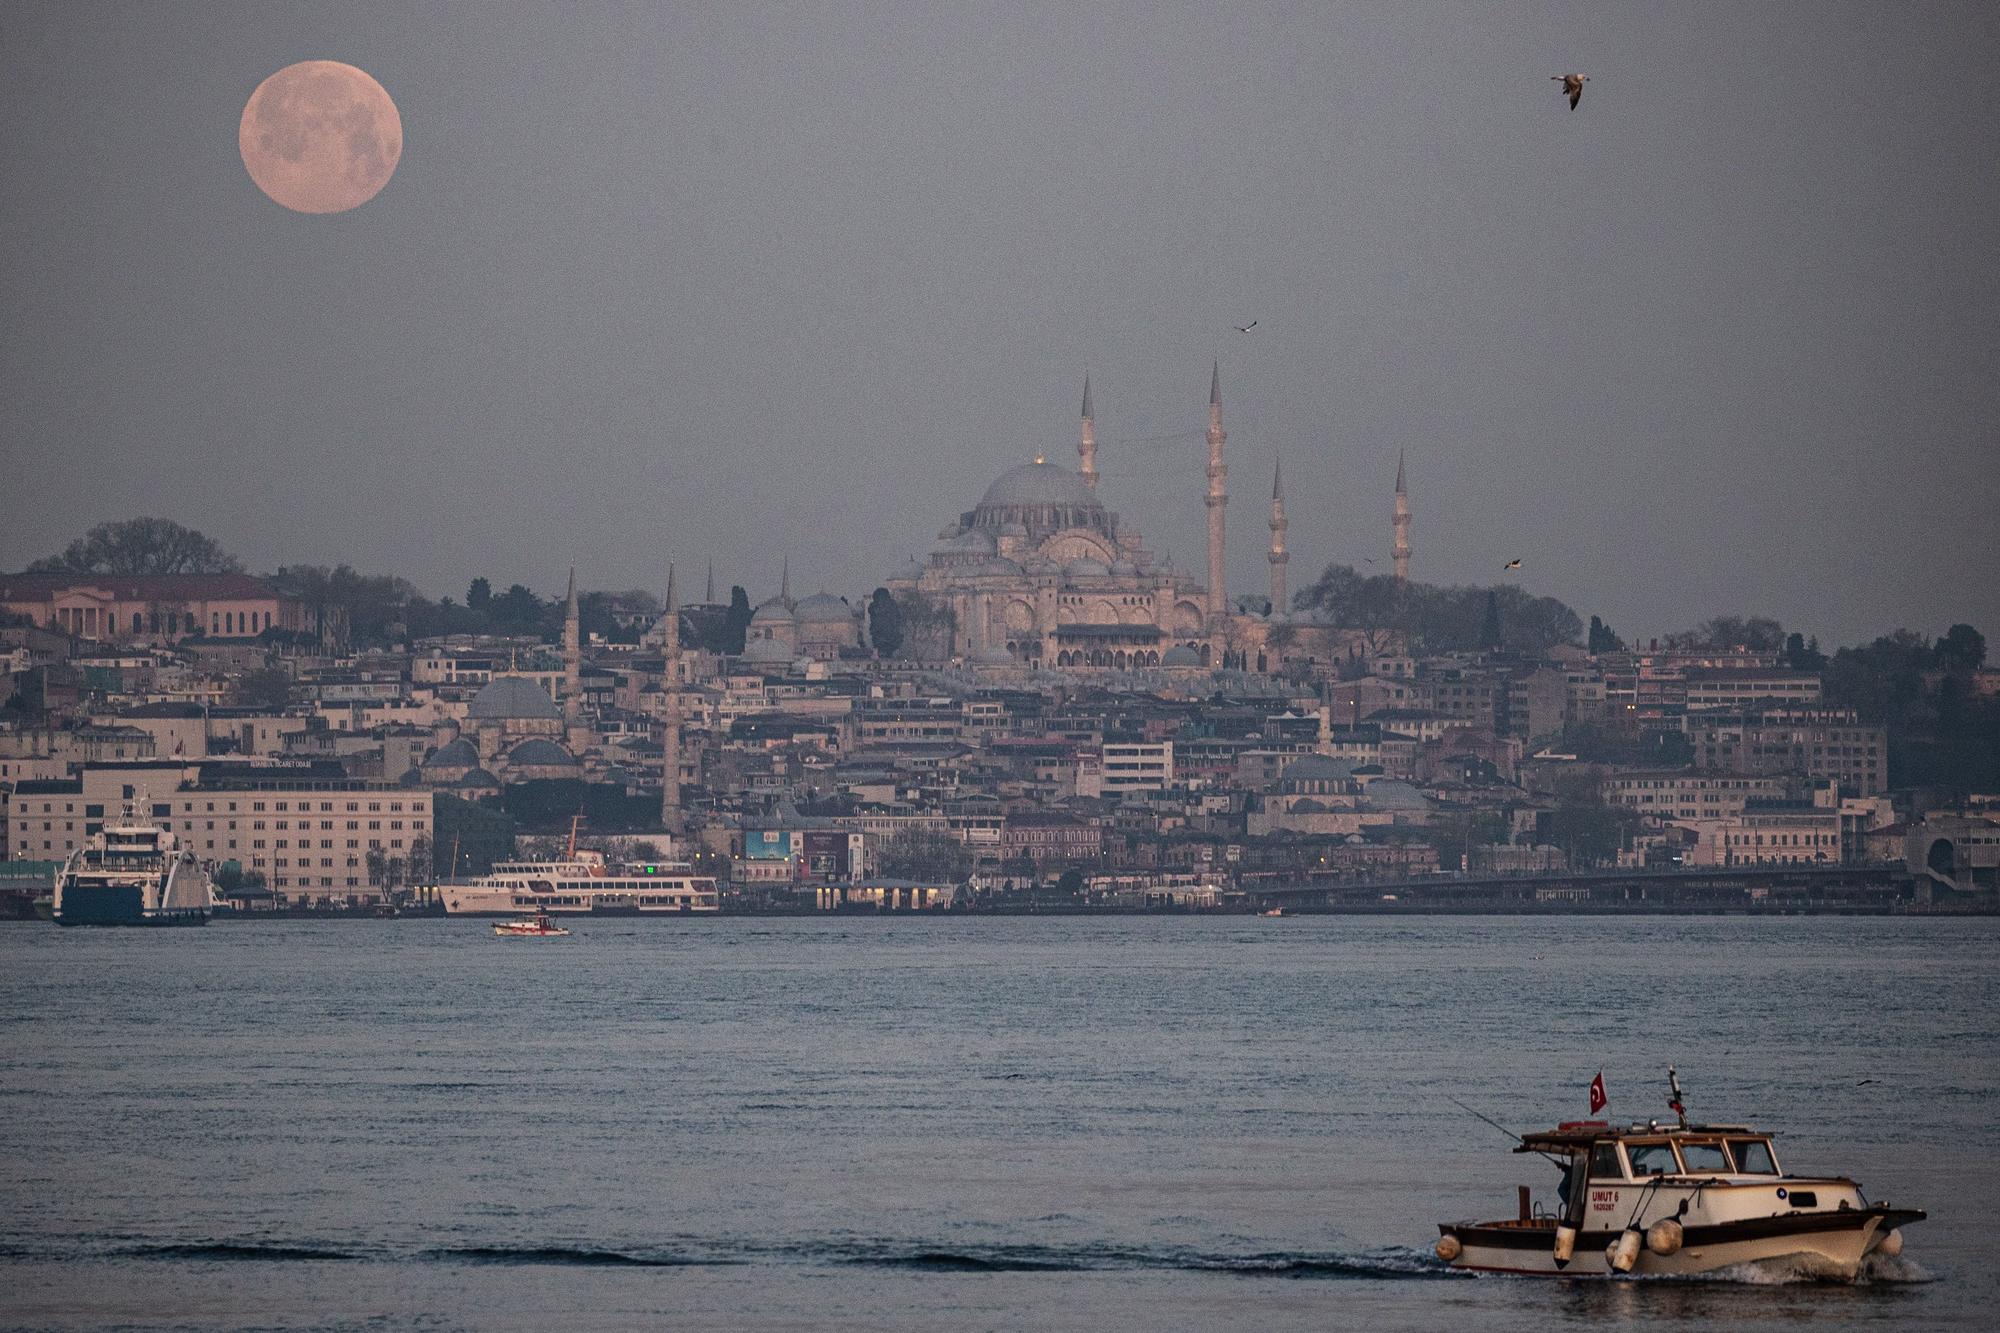 Super full moon seen (109393346).jpg